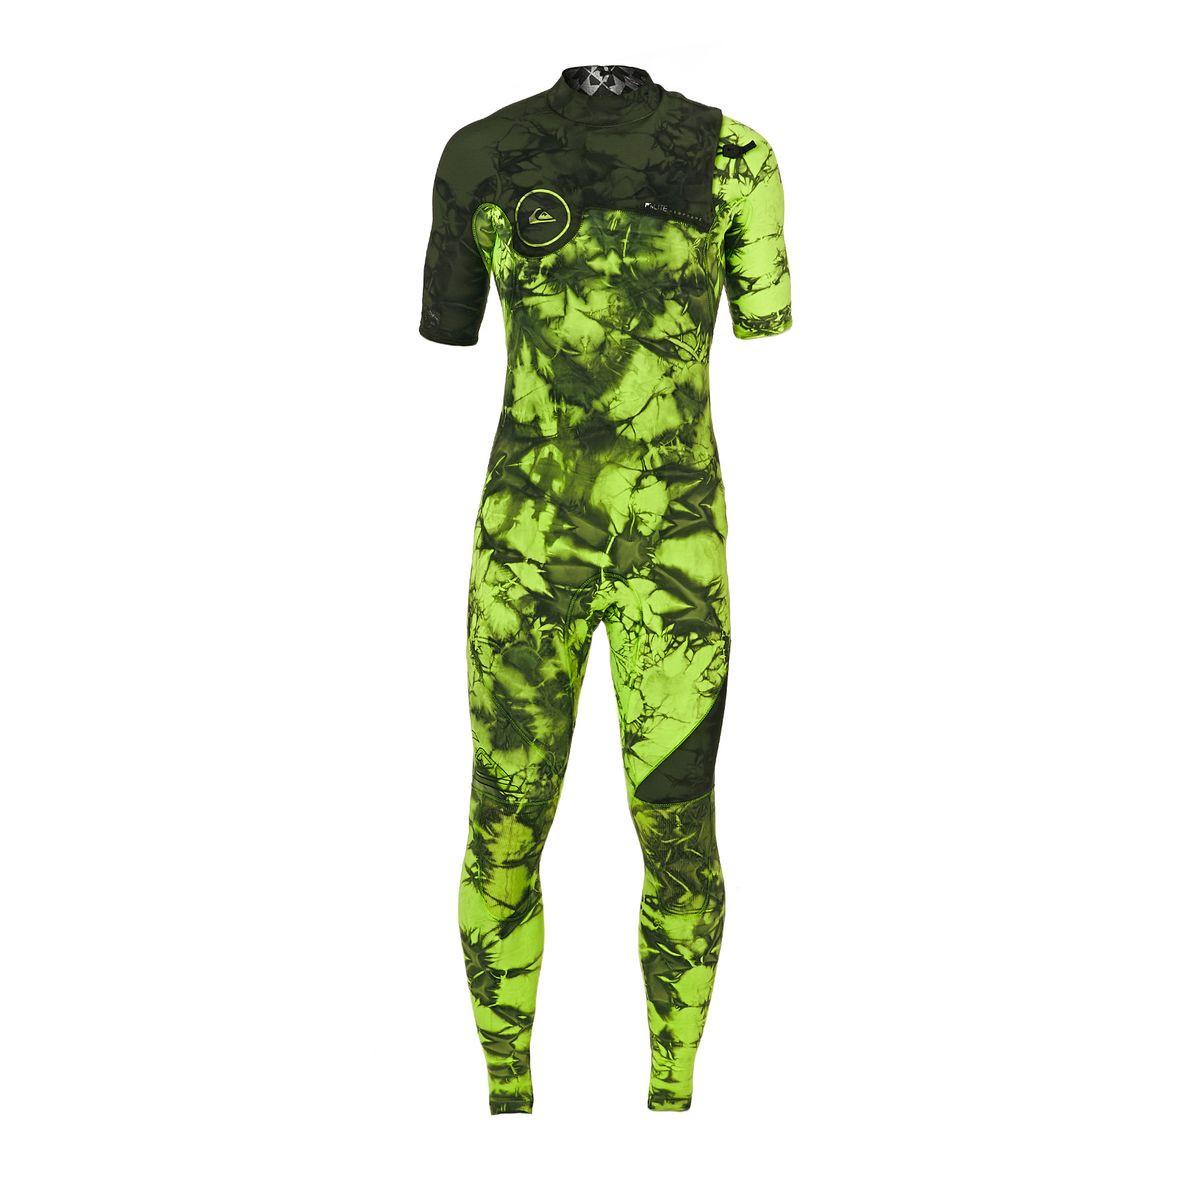 Quiksilver Highline Dye Capsule 2mm 2017 Short Sleeve Zipperless Wetsuit - Green Flash